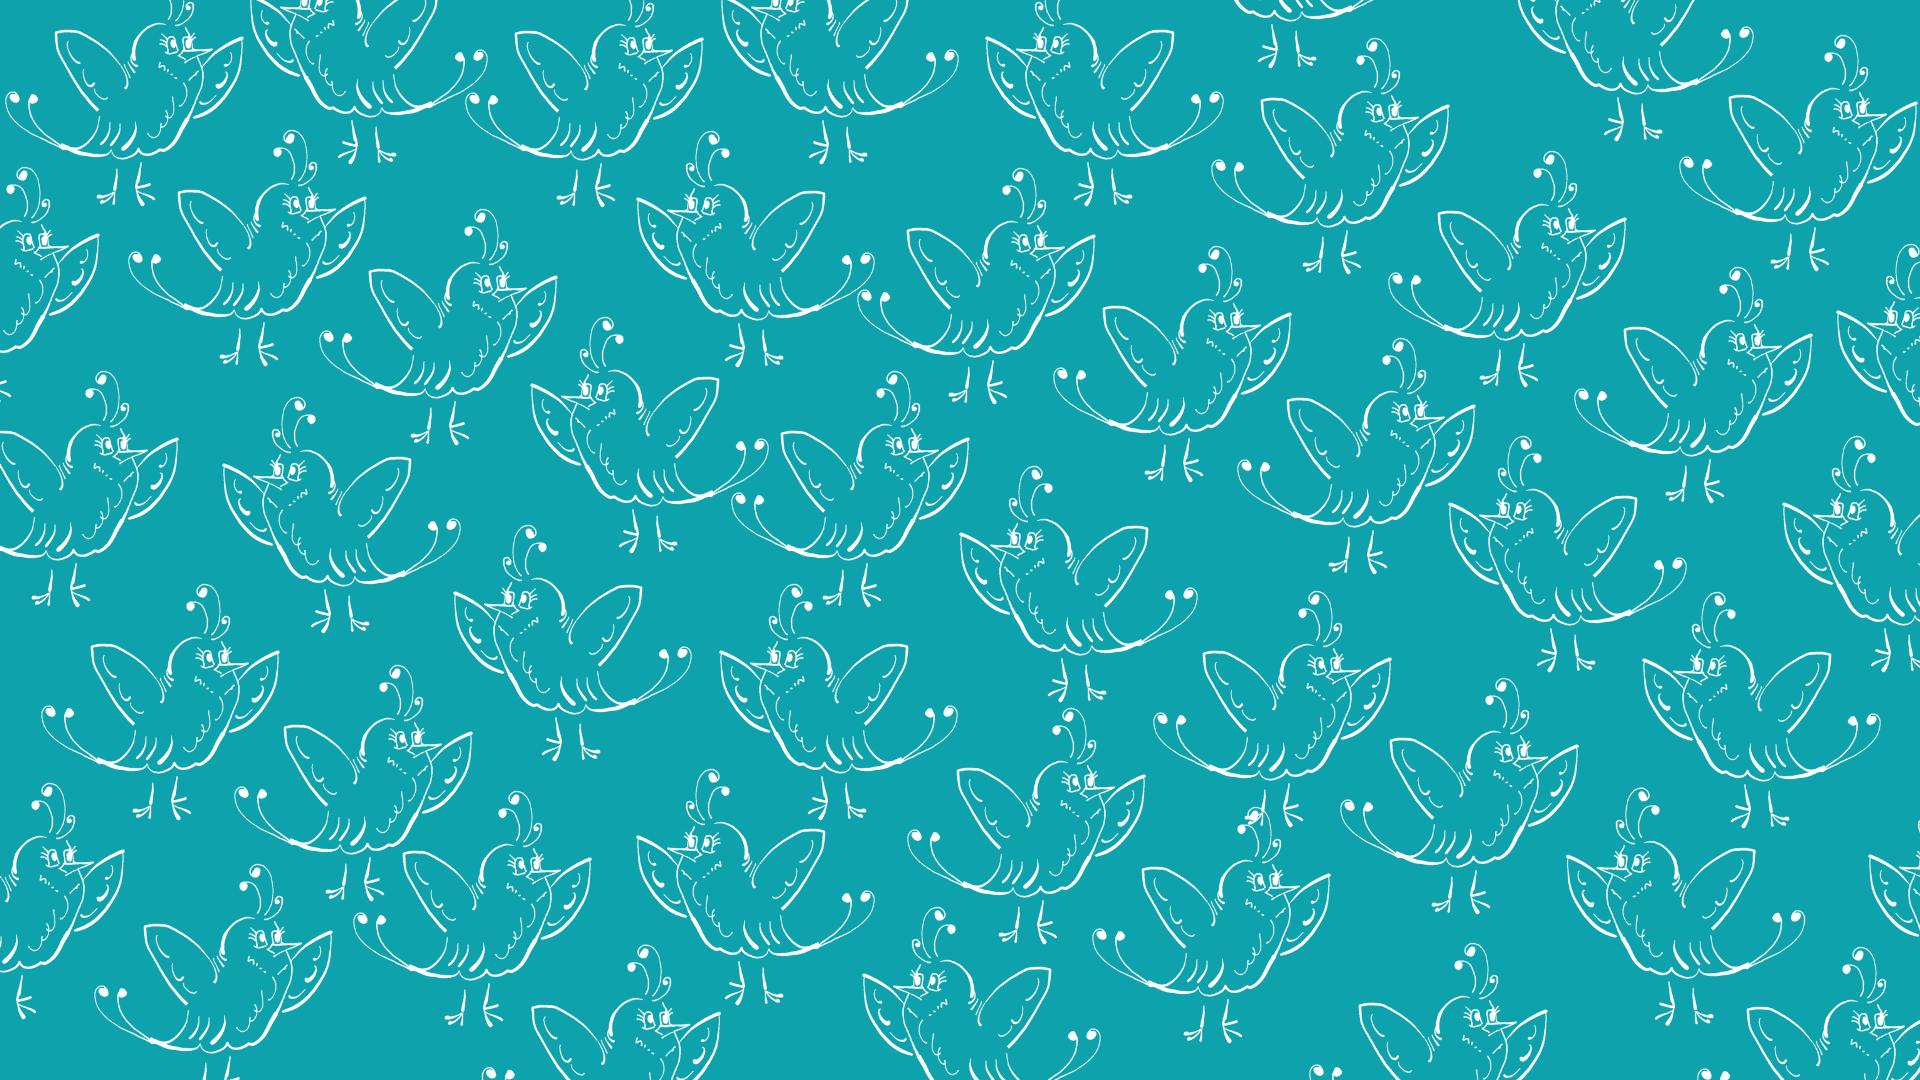 patroon birds chanthal hagedoorn